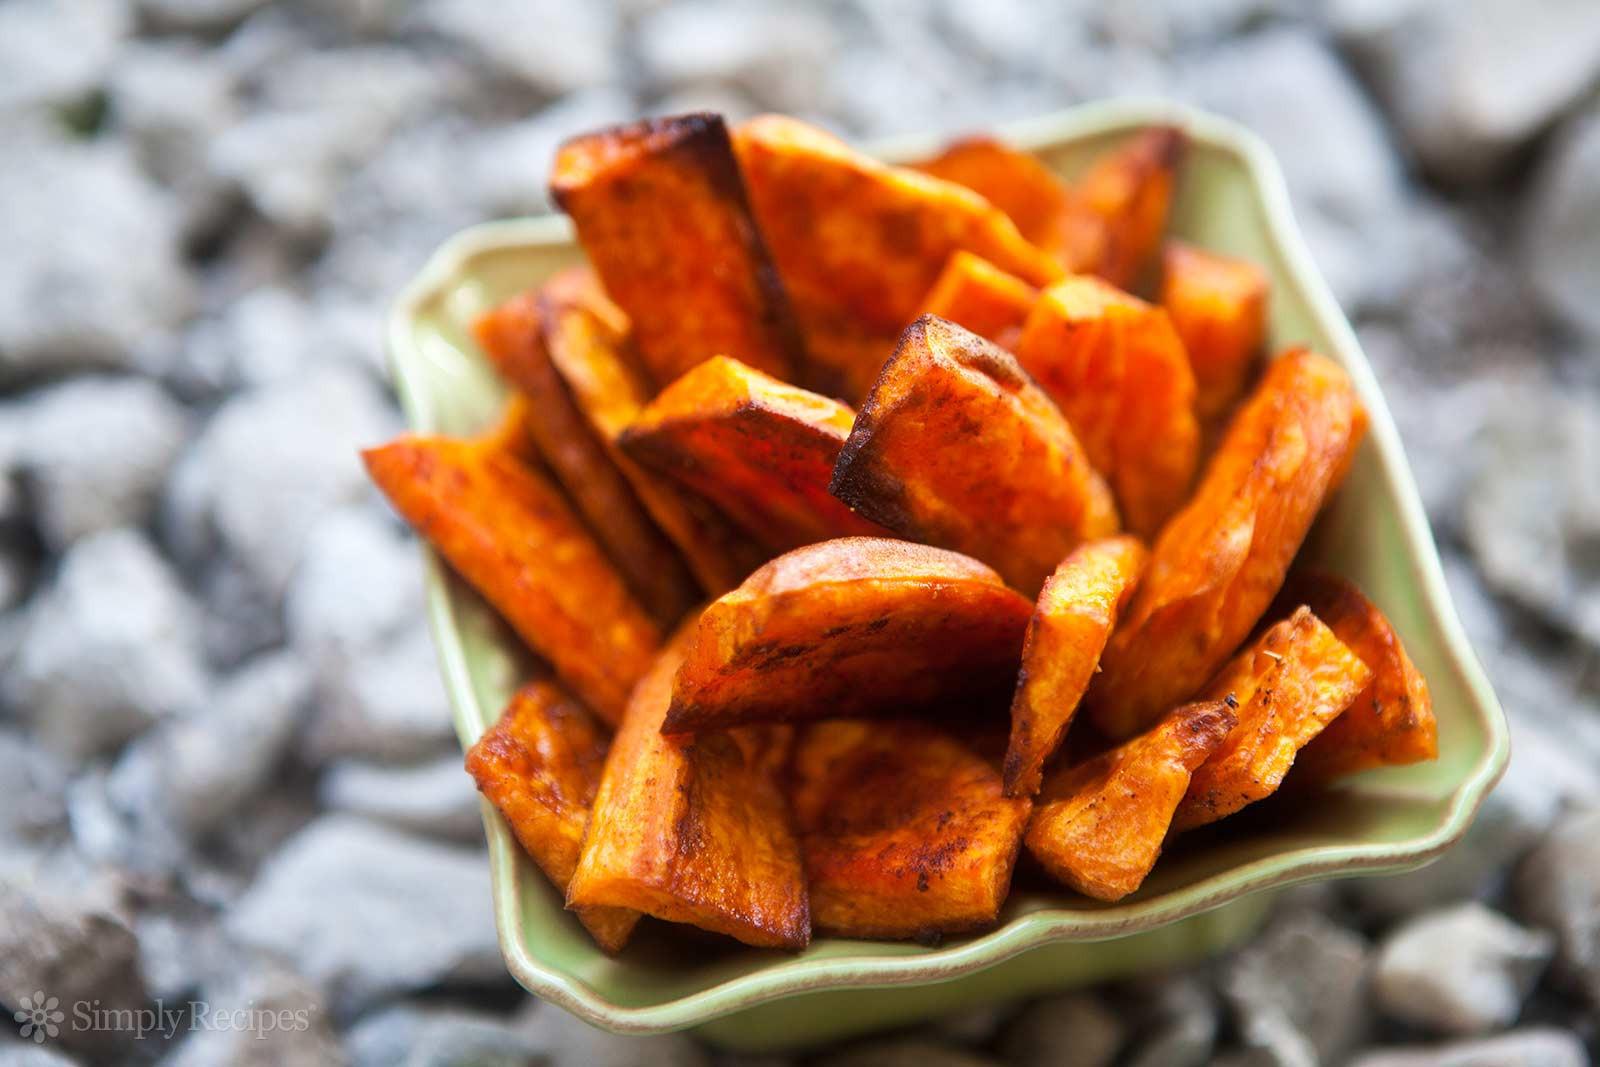 Sweet Potato Oven Fries  Oven Baked Sweet Potato Fries Recipe